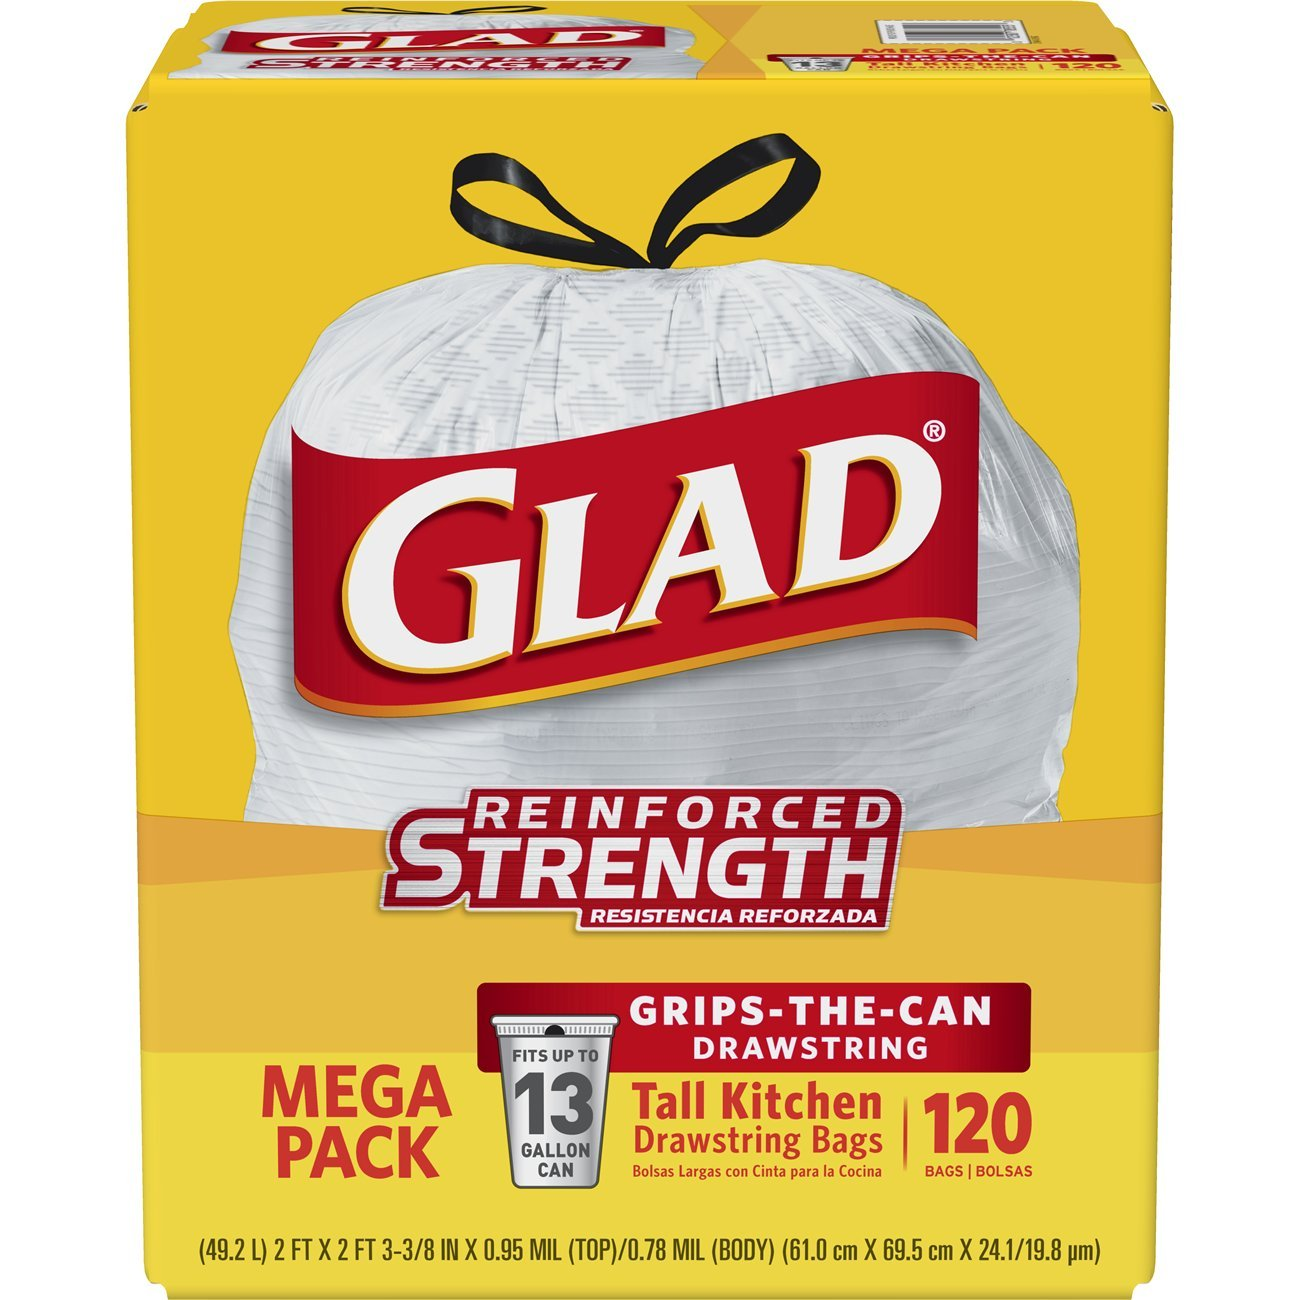 Glad Tall Kitchen Drawstring Trash Bags - 13 Gallon White Trash Bag - 120 Count by Glad